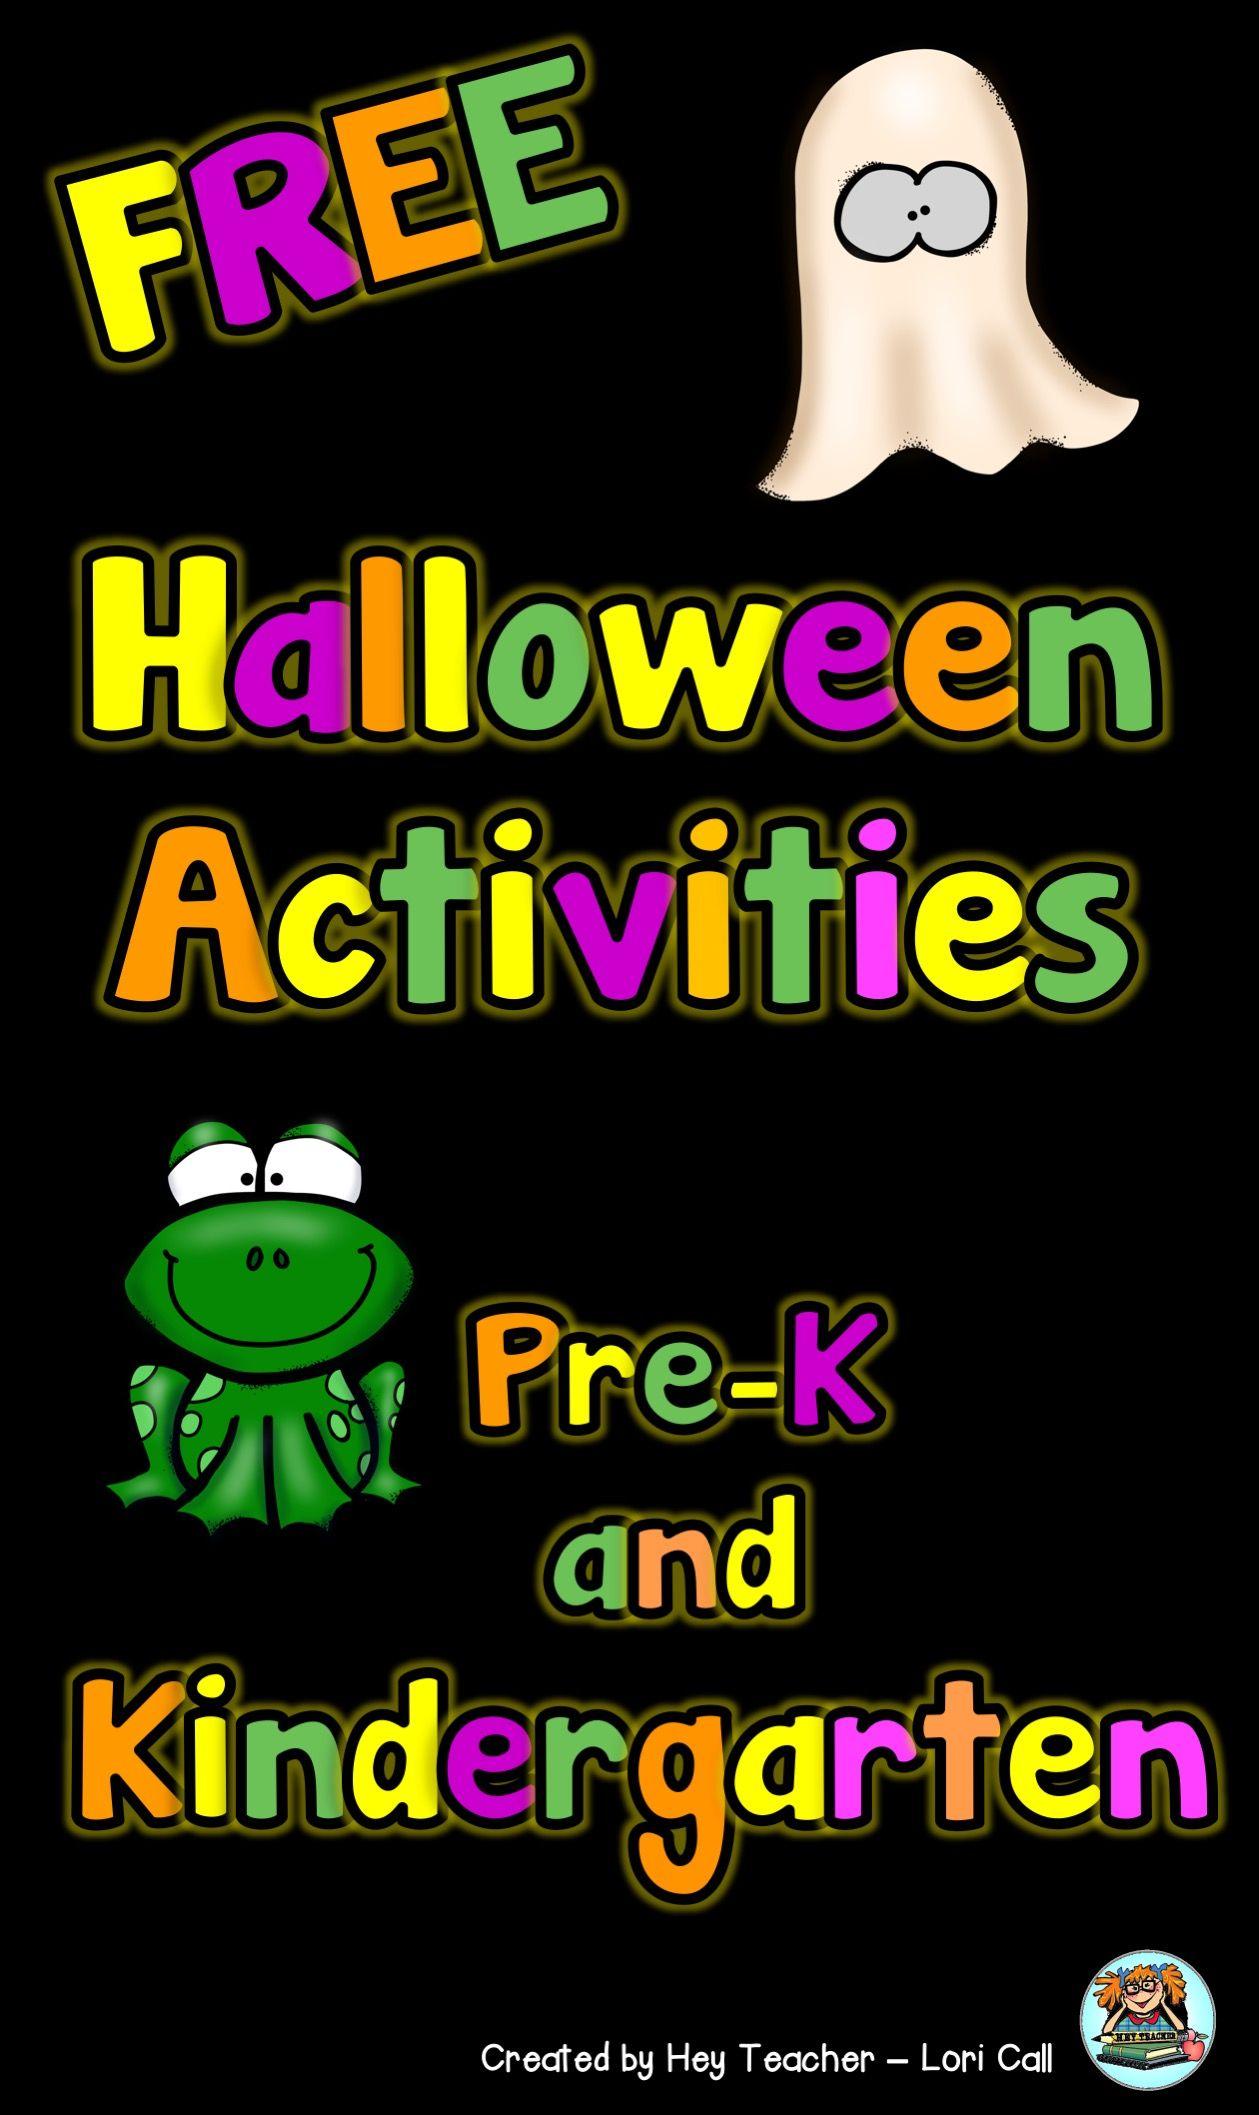 Free Halloween Printable For Pre K And Kindergarten Kids